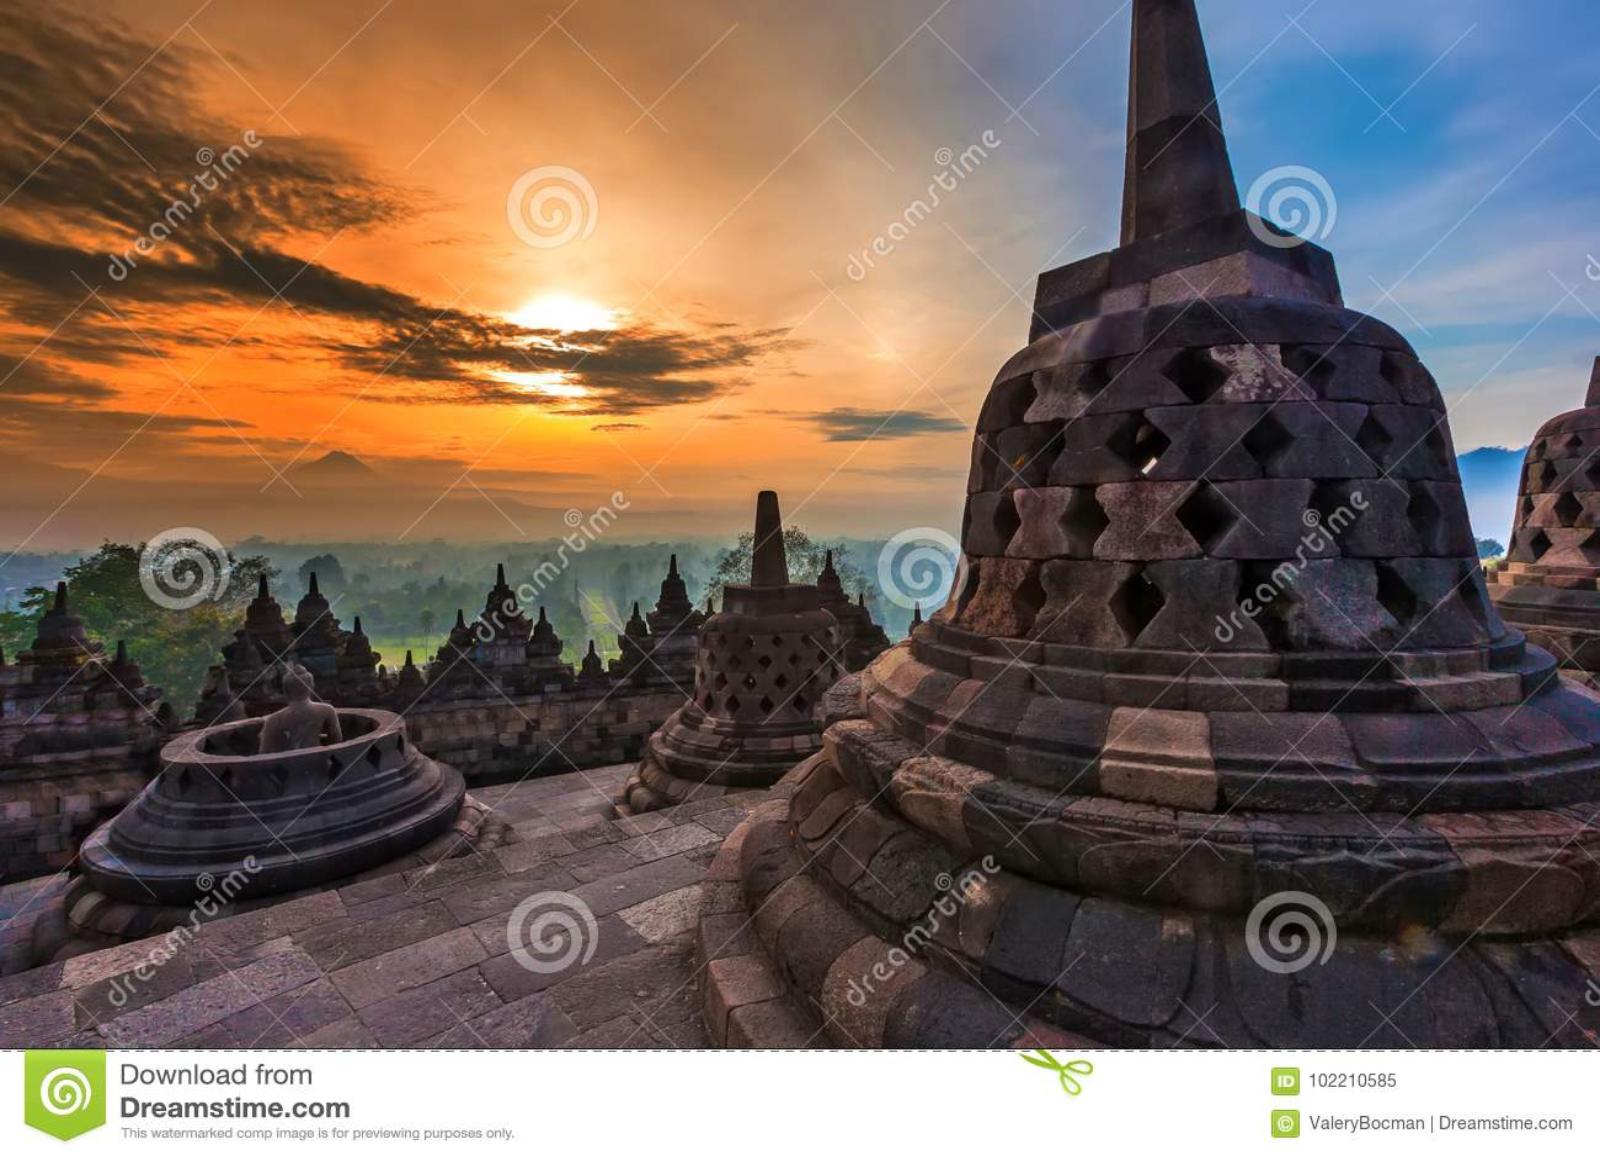 Candi Borobudur, Yogyakarta, Jawa, Indonesia